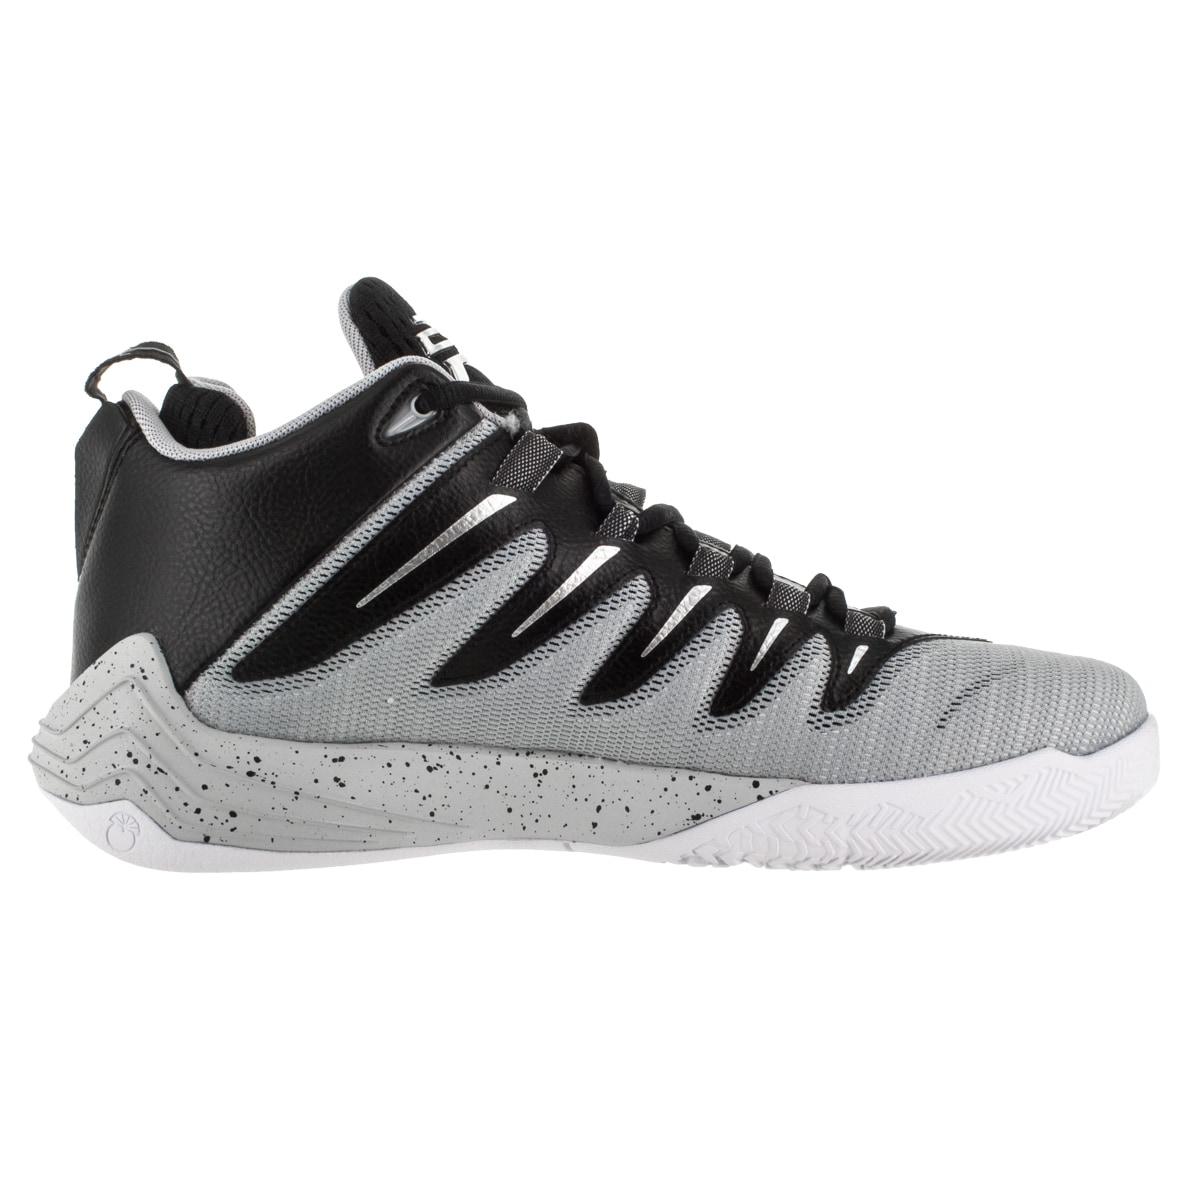 brand new 2fb31 3536b Shop Nike Jordan Men s Jordan Cp3.Ix Black Metallic Silver Wlf  Pr Plt  Basketball Shoe - Free Shipping Today - Overstock - 12318263